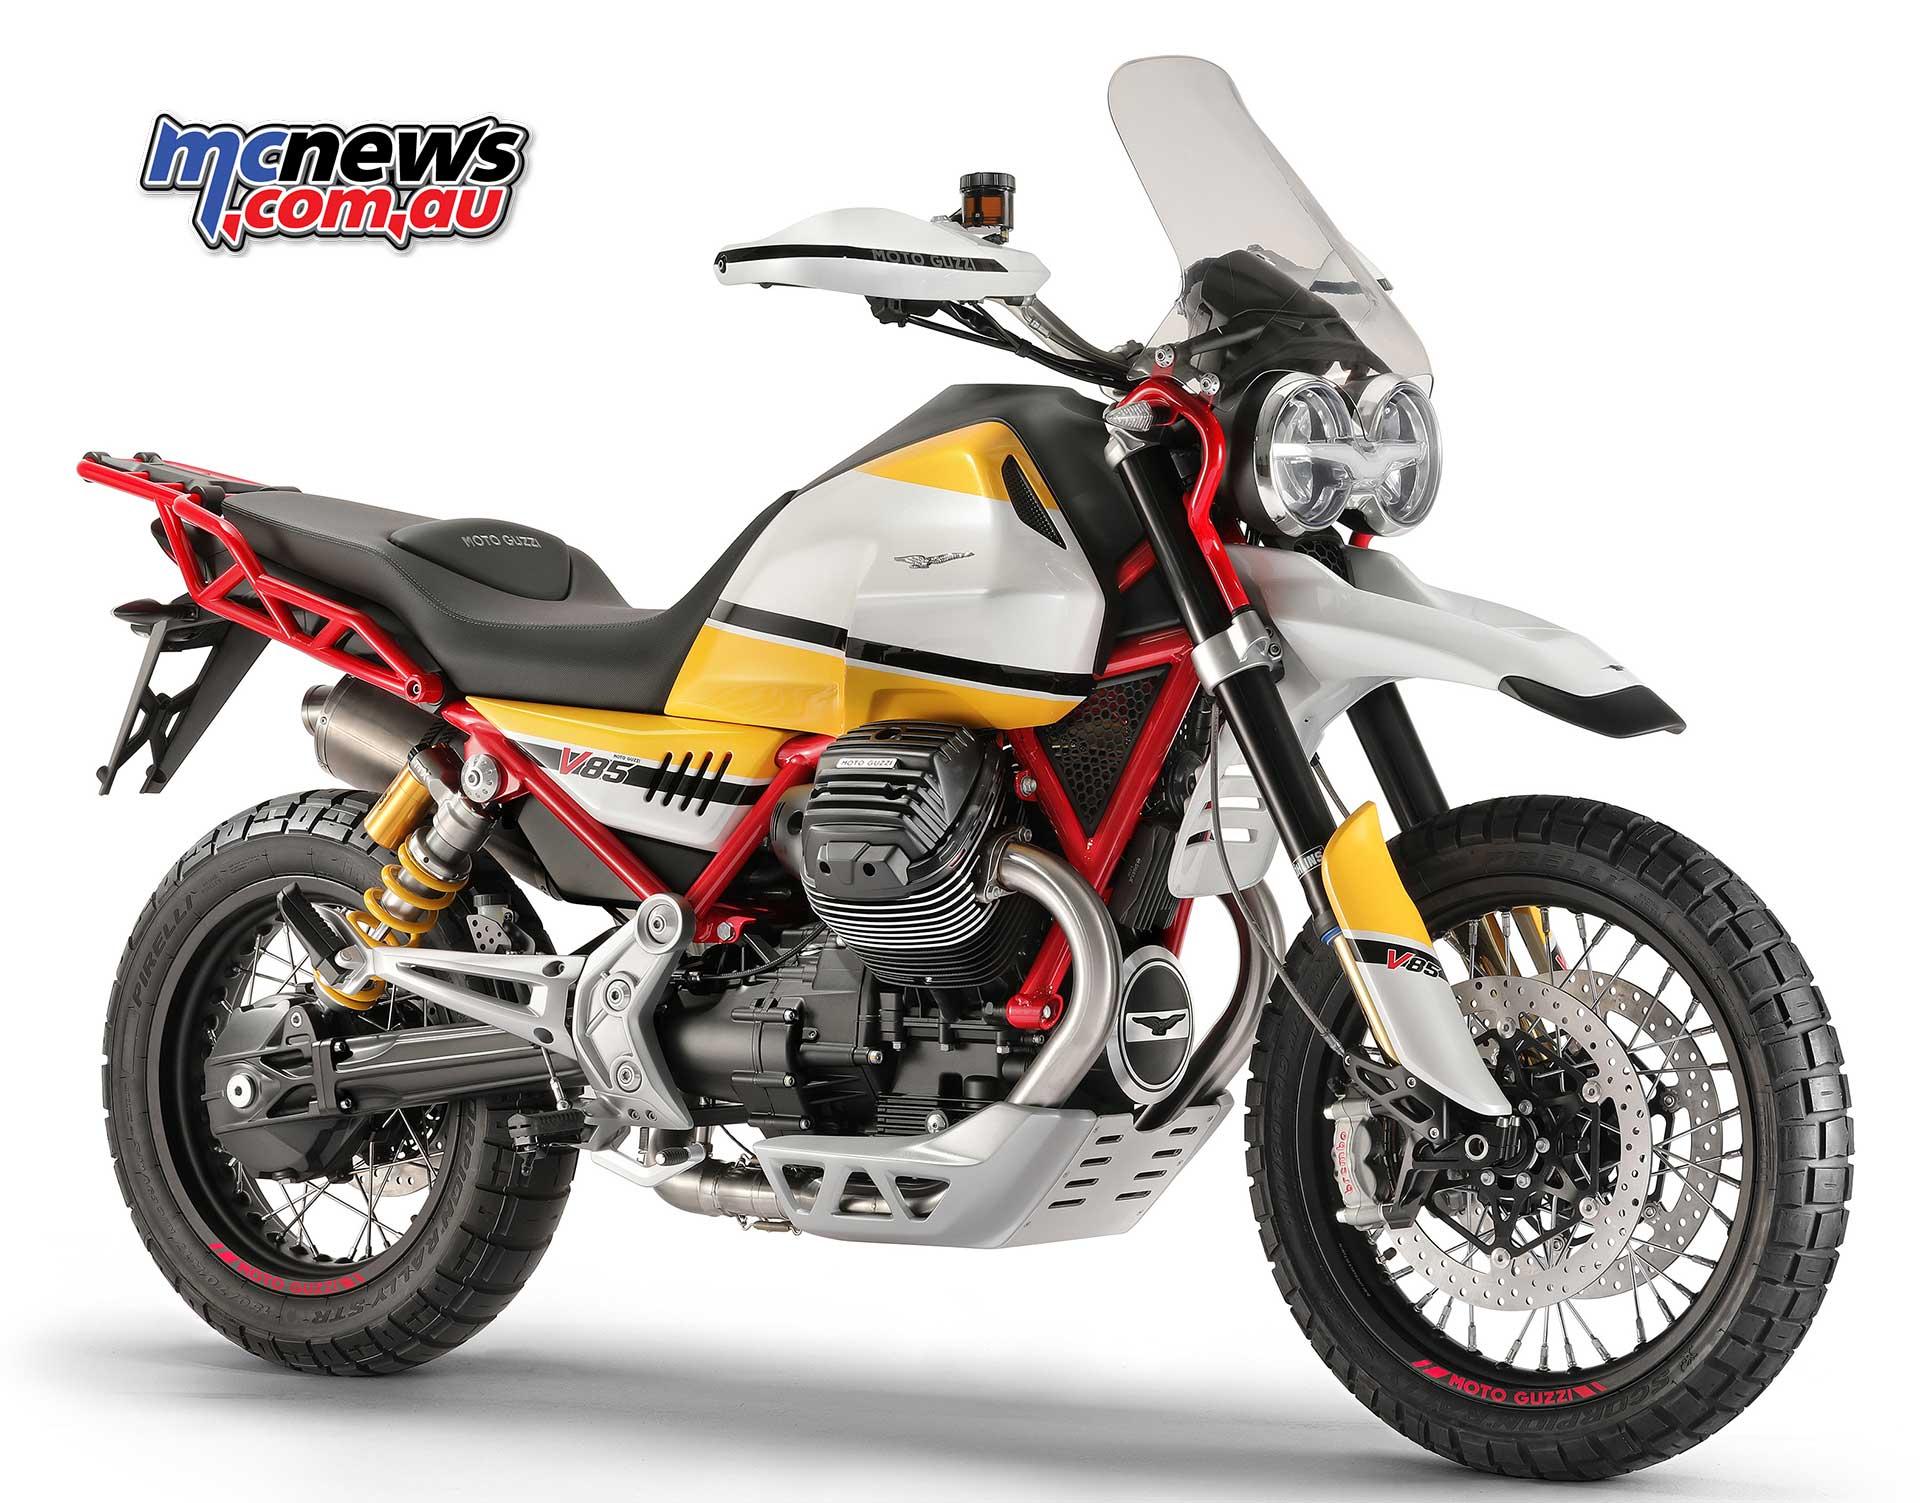 moto guzzi v85 80hp new 850cc engine new frame. Black Bedroom Furniture Sets. Home Design Ideas